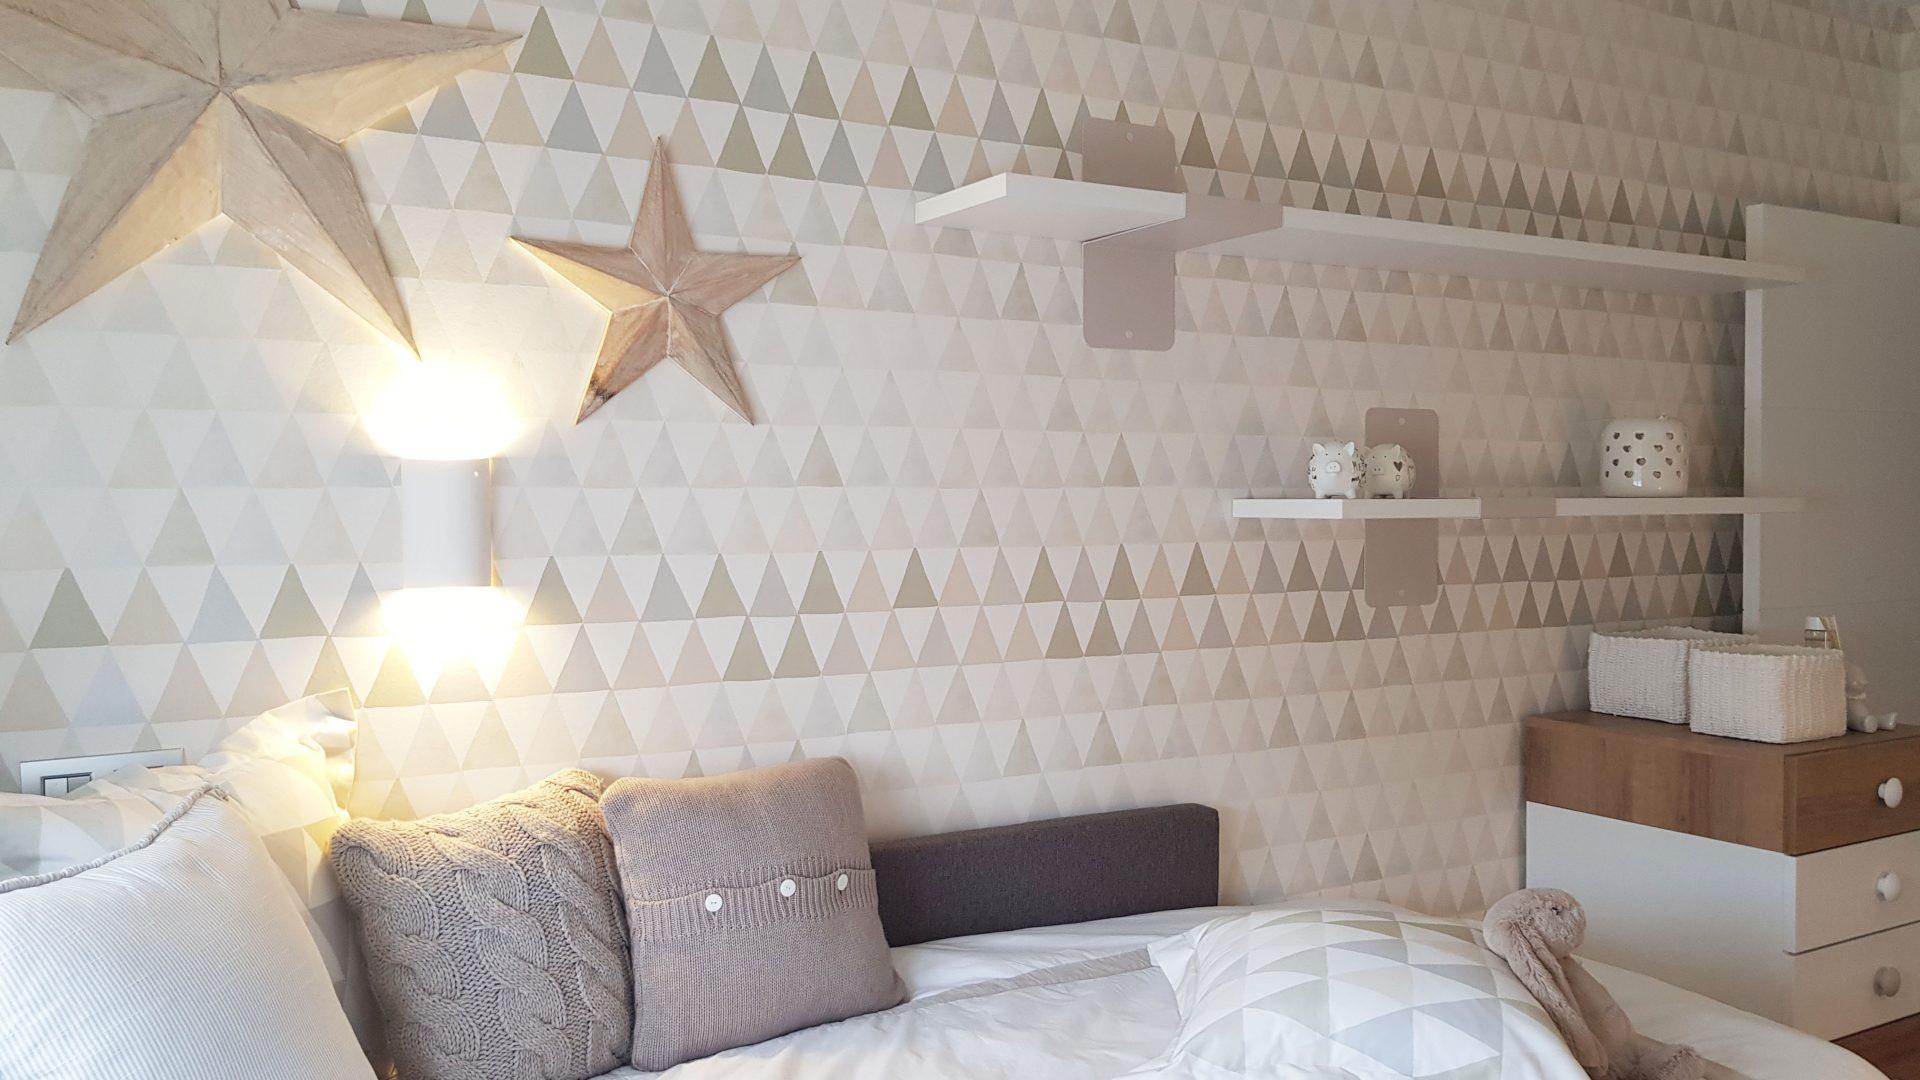 mugarri_decoracion_dormitorio_baño_hall_bizkaia 01